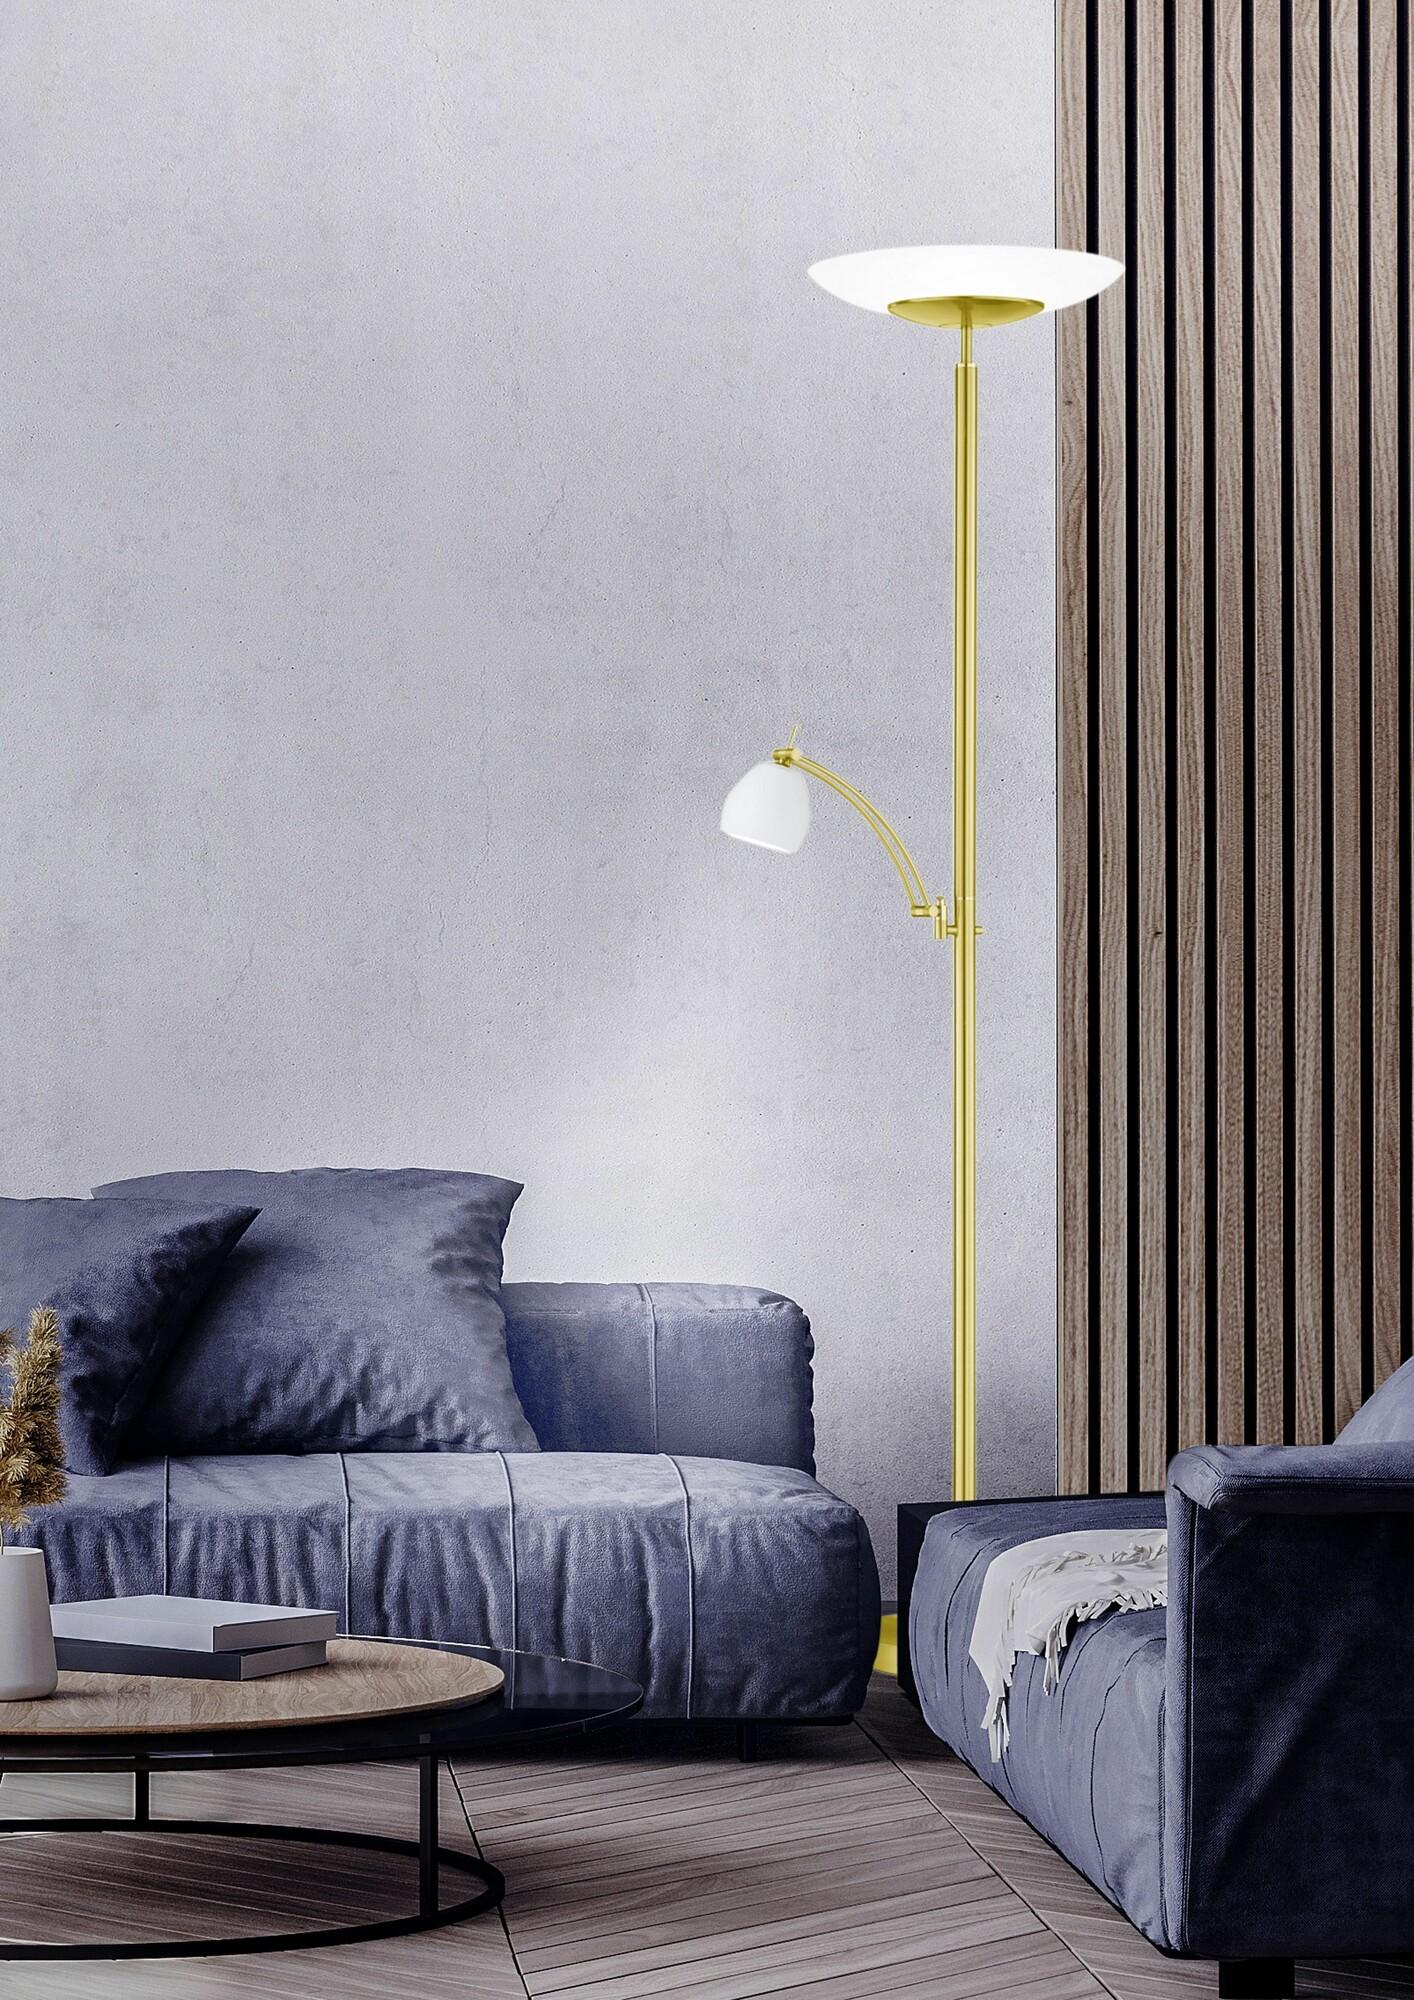 CENTURION Vloerlamp LED 2x30W/1500lm Goud